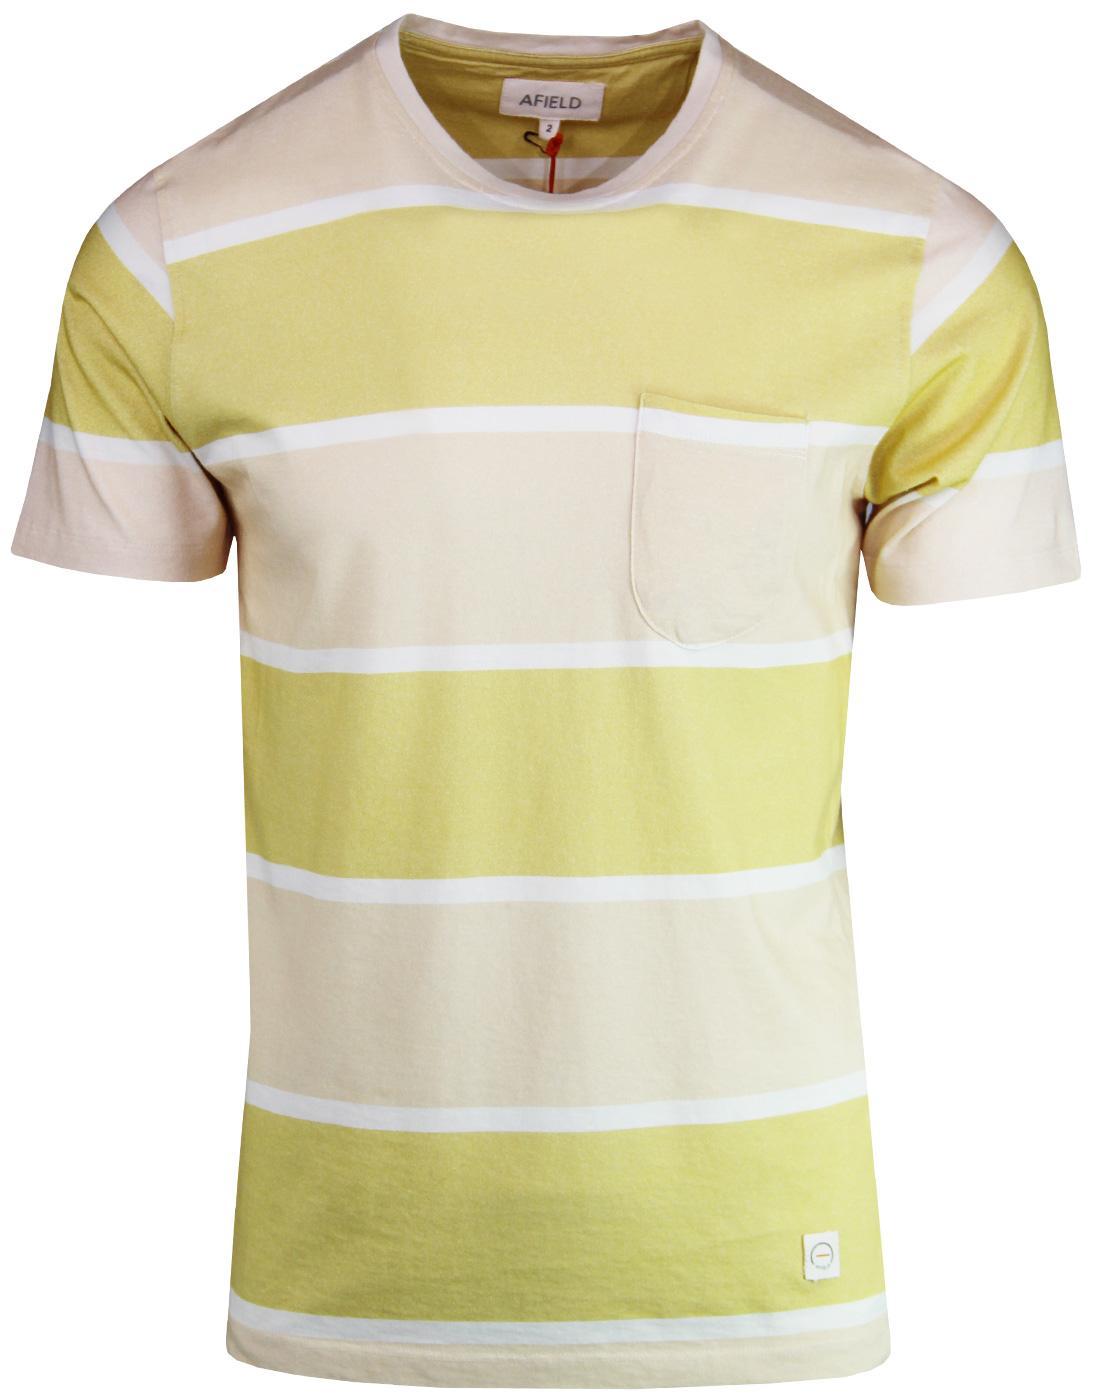 Dos AFIELD Men's Retro 1970s Block Stripe T-shirt